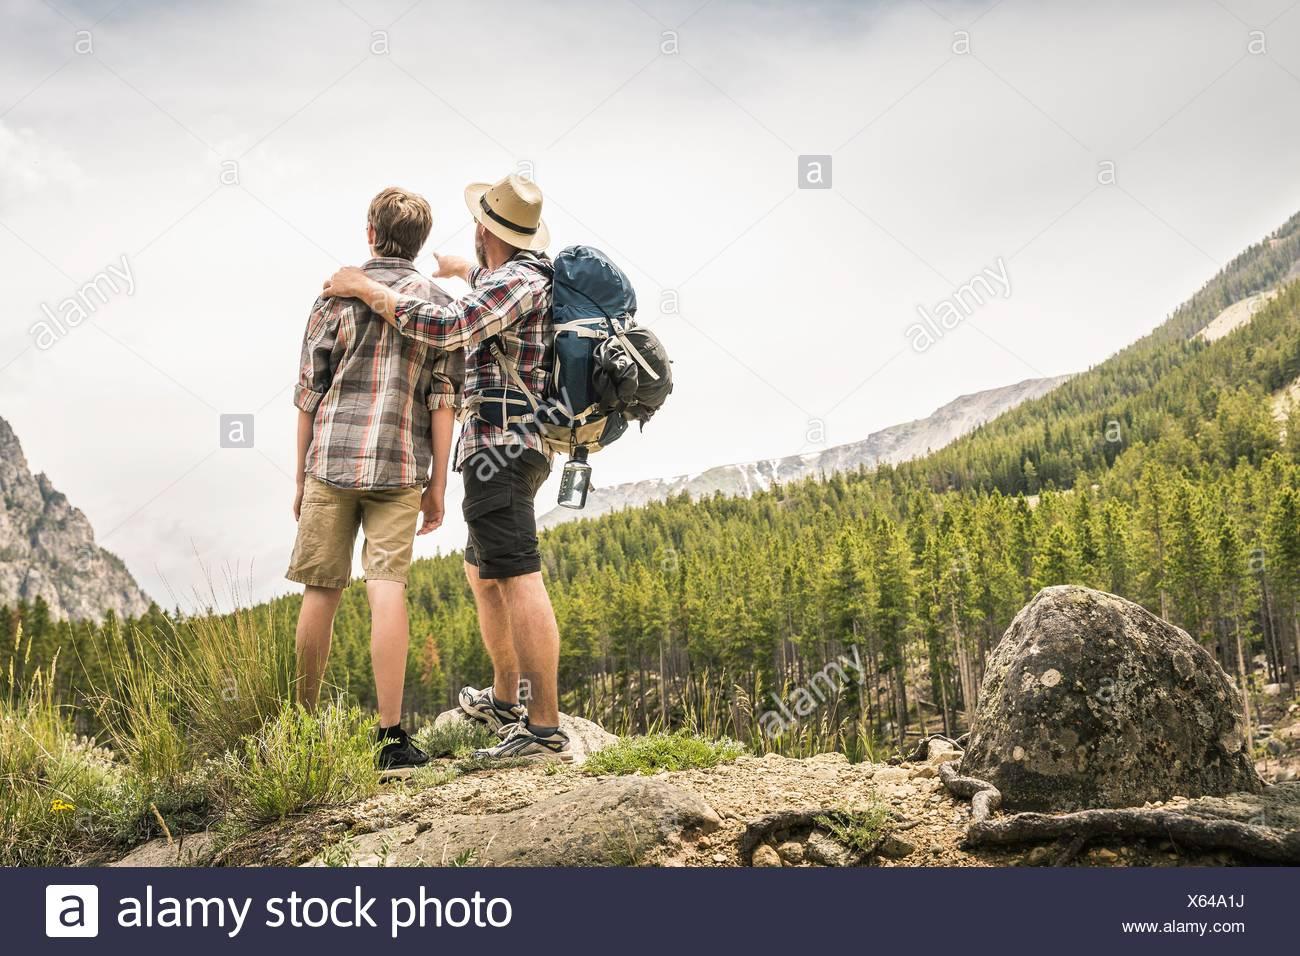 Rückansicht von Vater und Sohn, trekking, wegschauen im Blick, Red Lodge, Montana, USA Stockbild